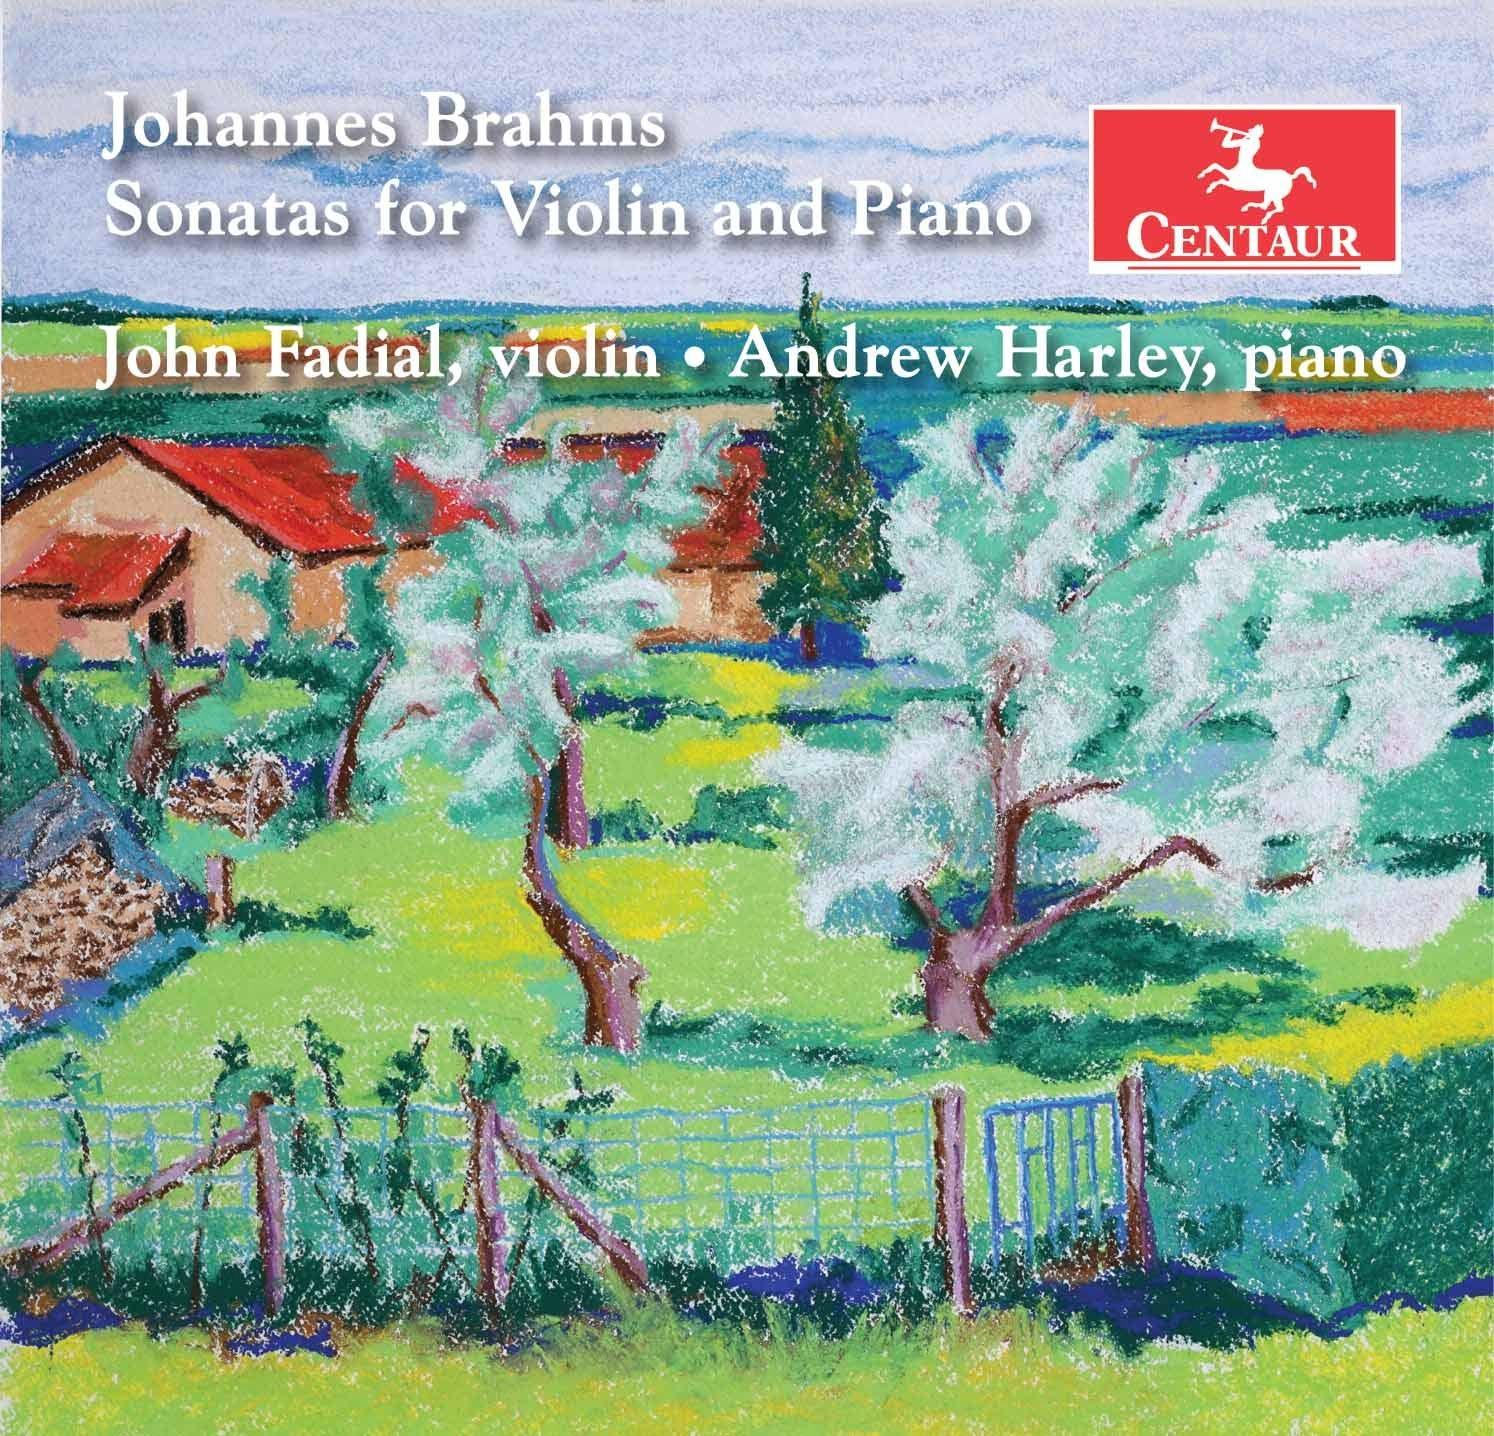 Sonatas for Violin & Piano - Brahms / Fadial / Harley - Musik -  - 0044747371122 - October 4, 2019